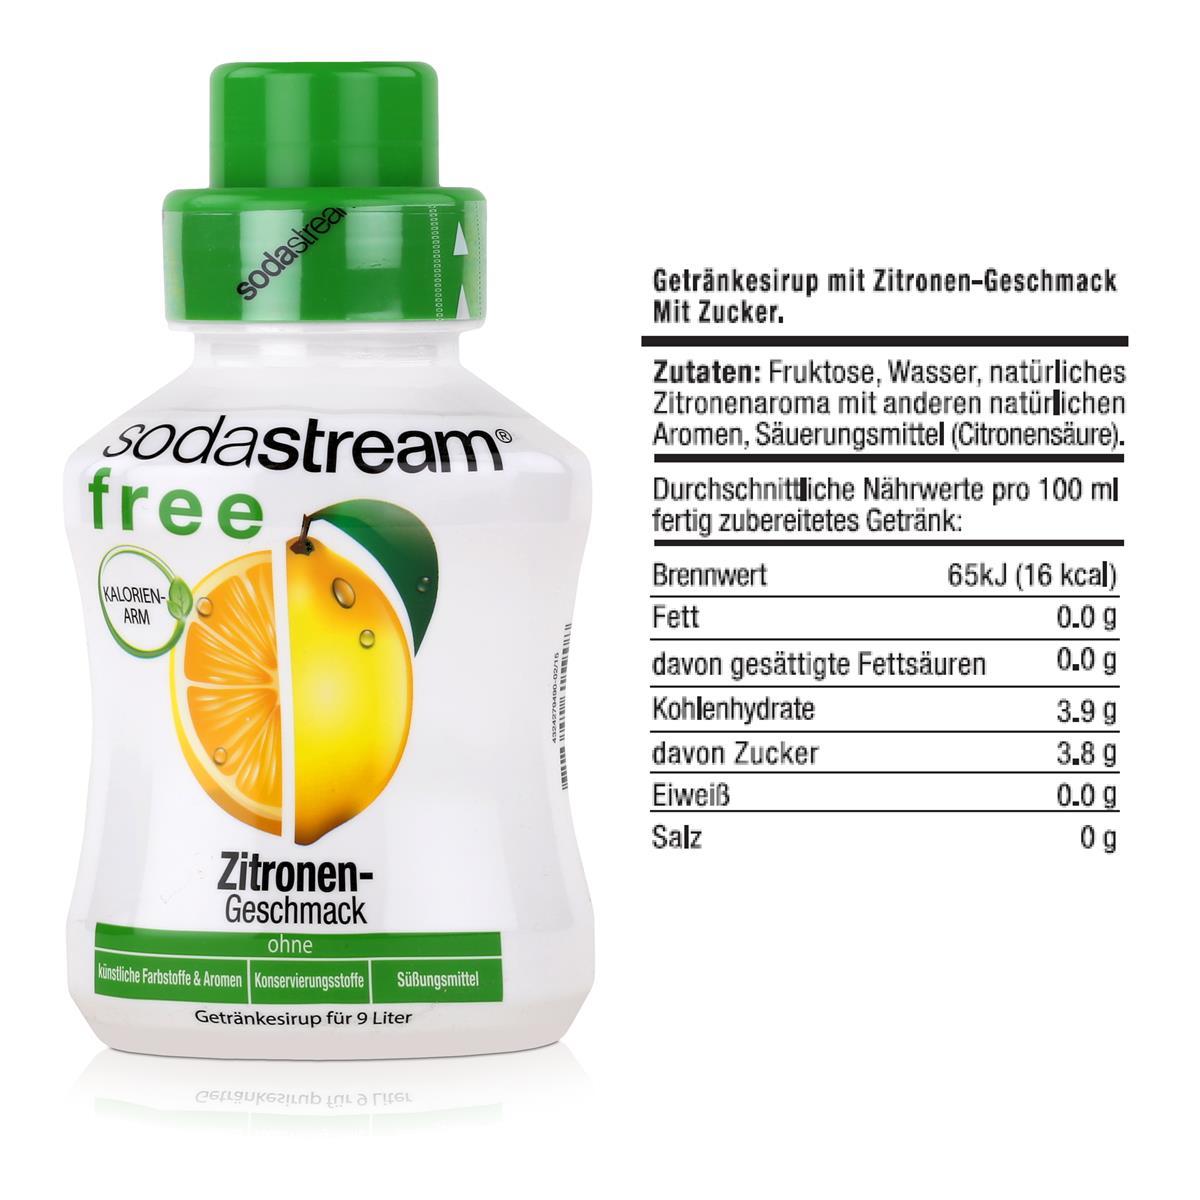 SodaStream Getränke-sirup Zitronen Geschmack 375ml (3er Pack) | eBay